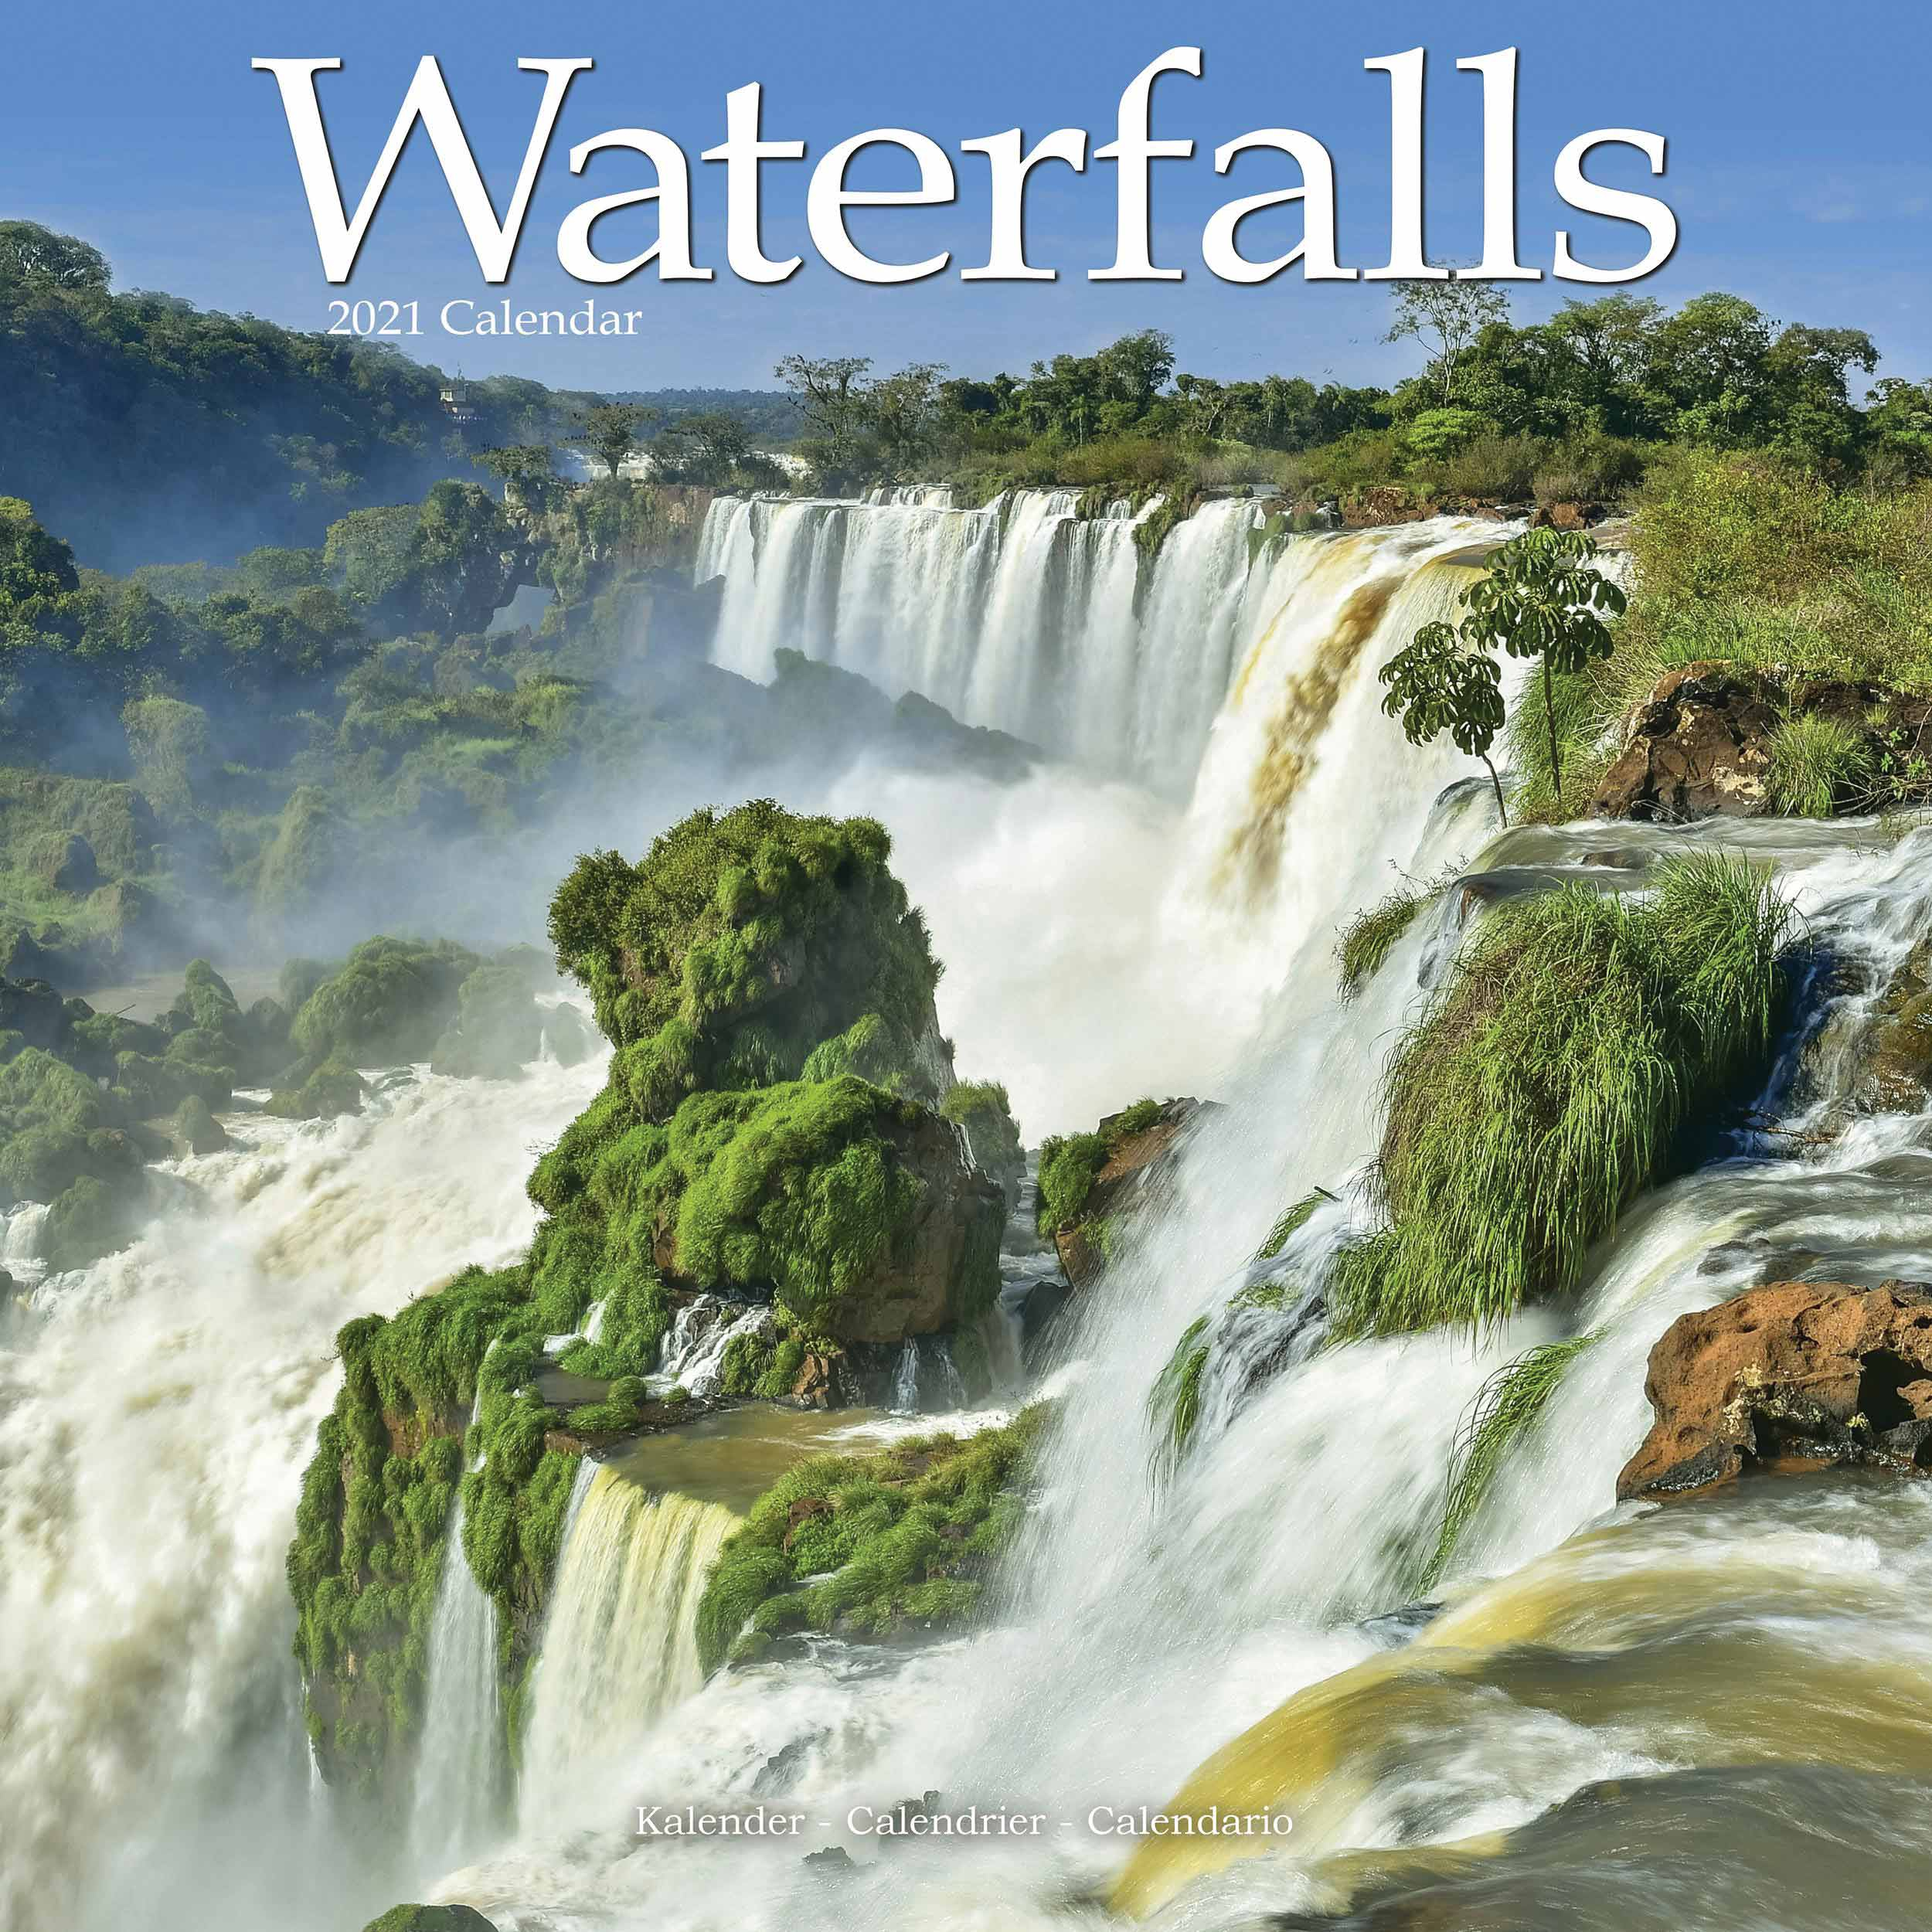 Waterfalls Calendar 2021 At Calendar Club Intended For Niagara Falls School Calendar 2021